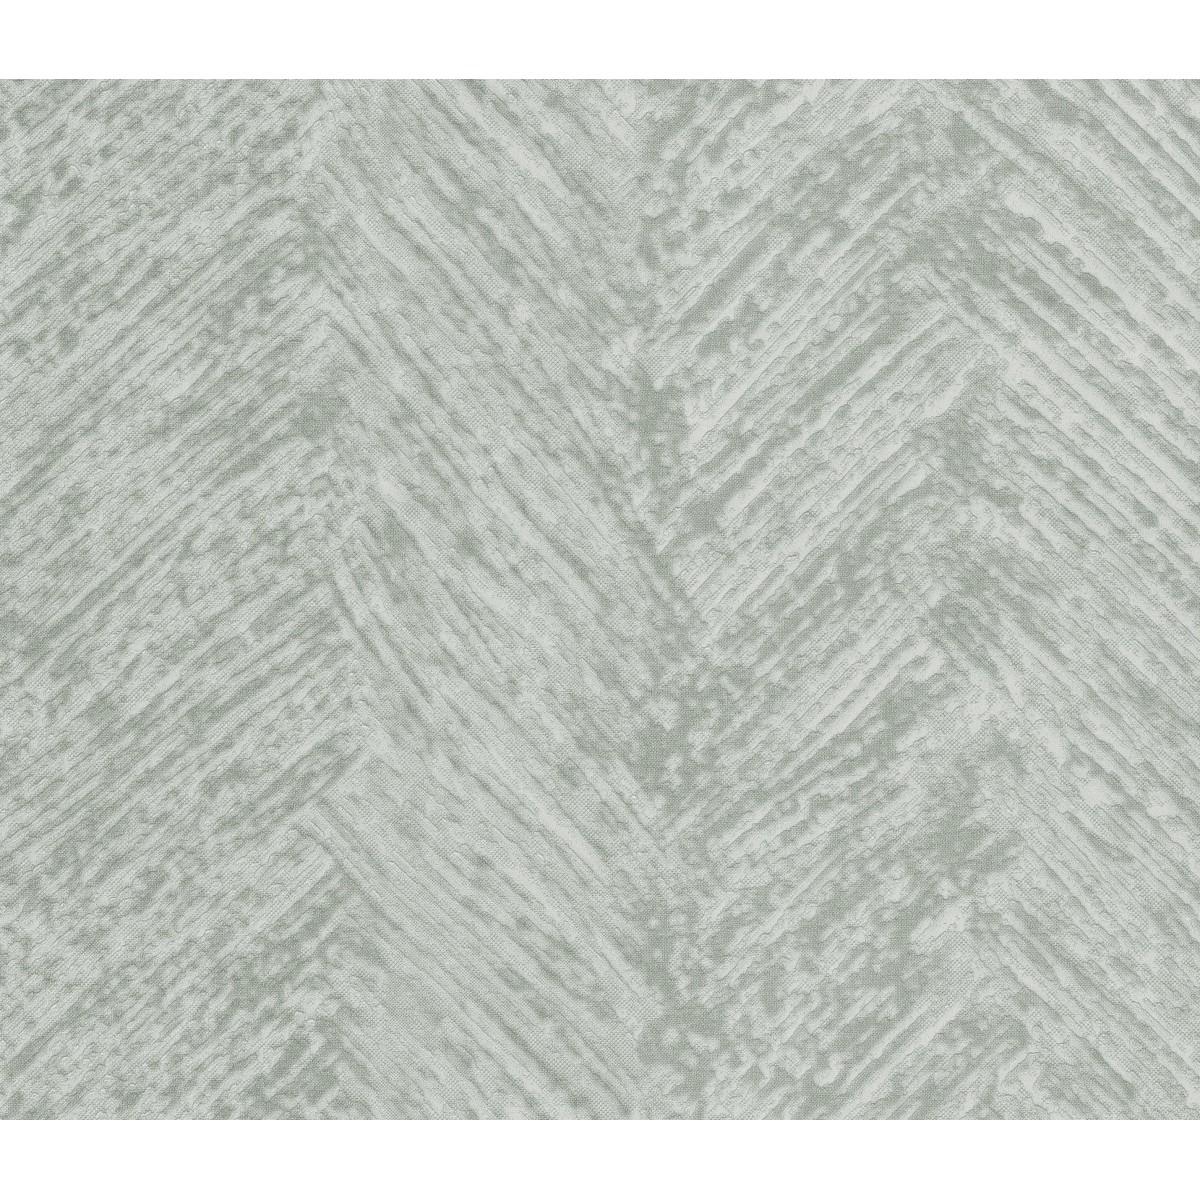 Обои флизелиновые Limonta Italian Wall Couture VETIVER серые 1.06 м 44207